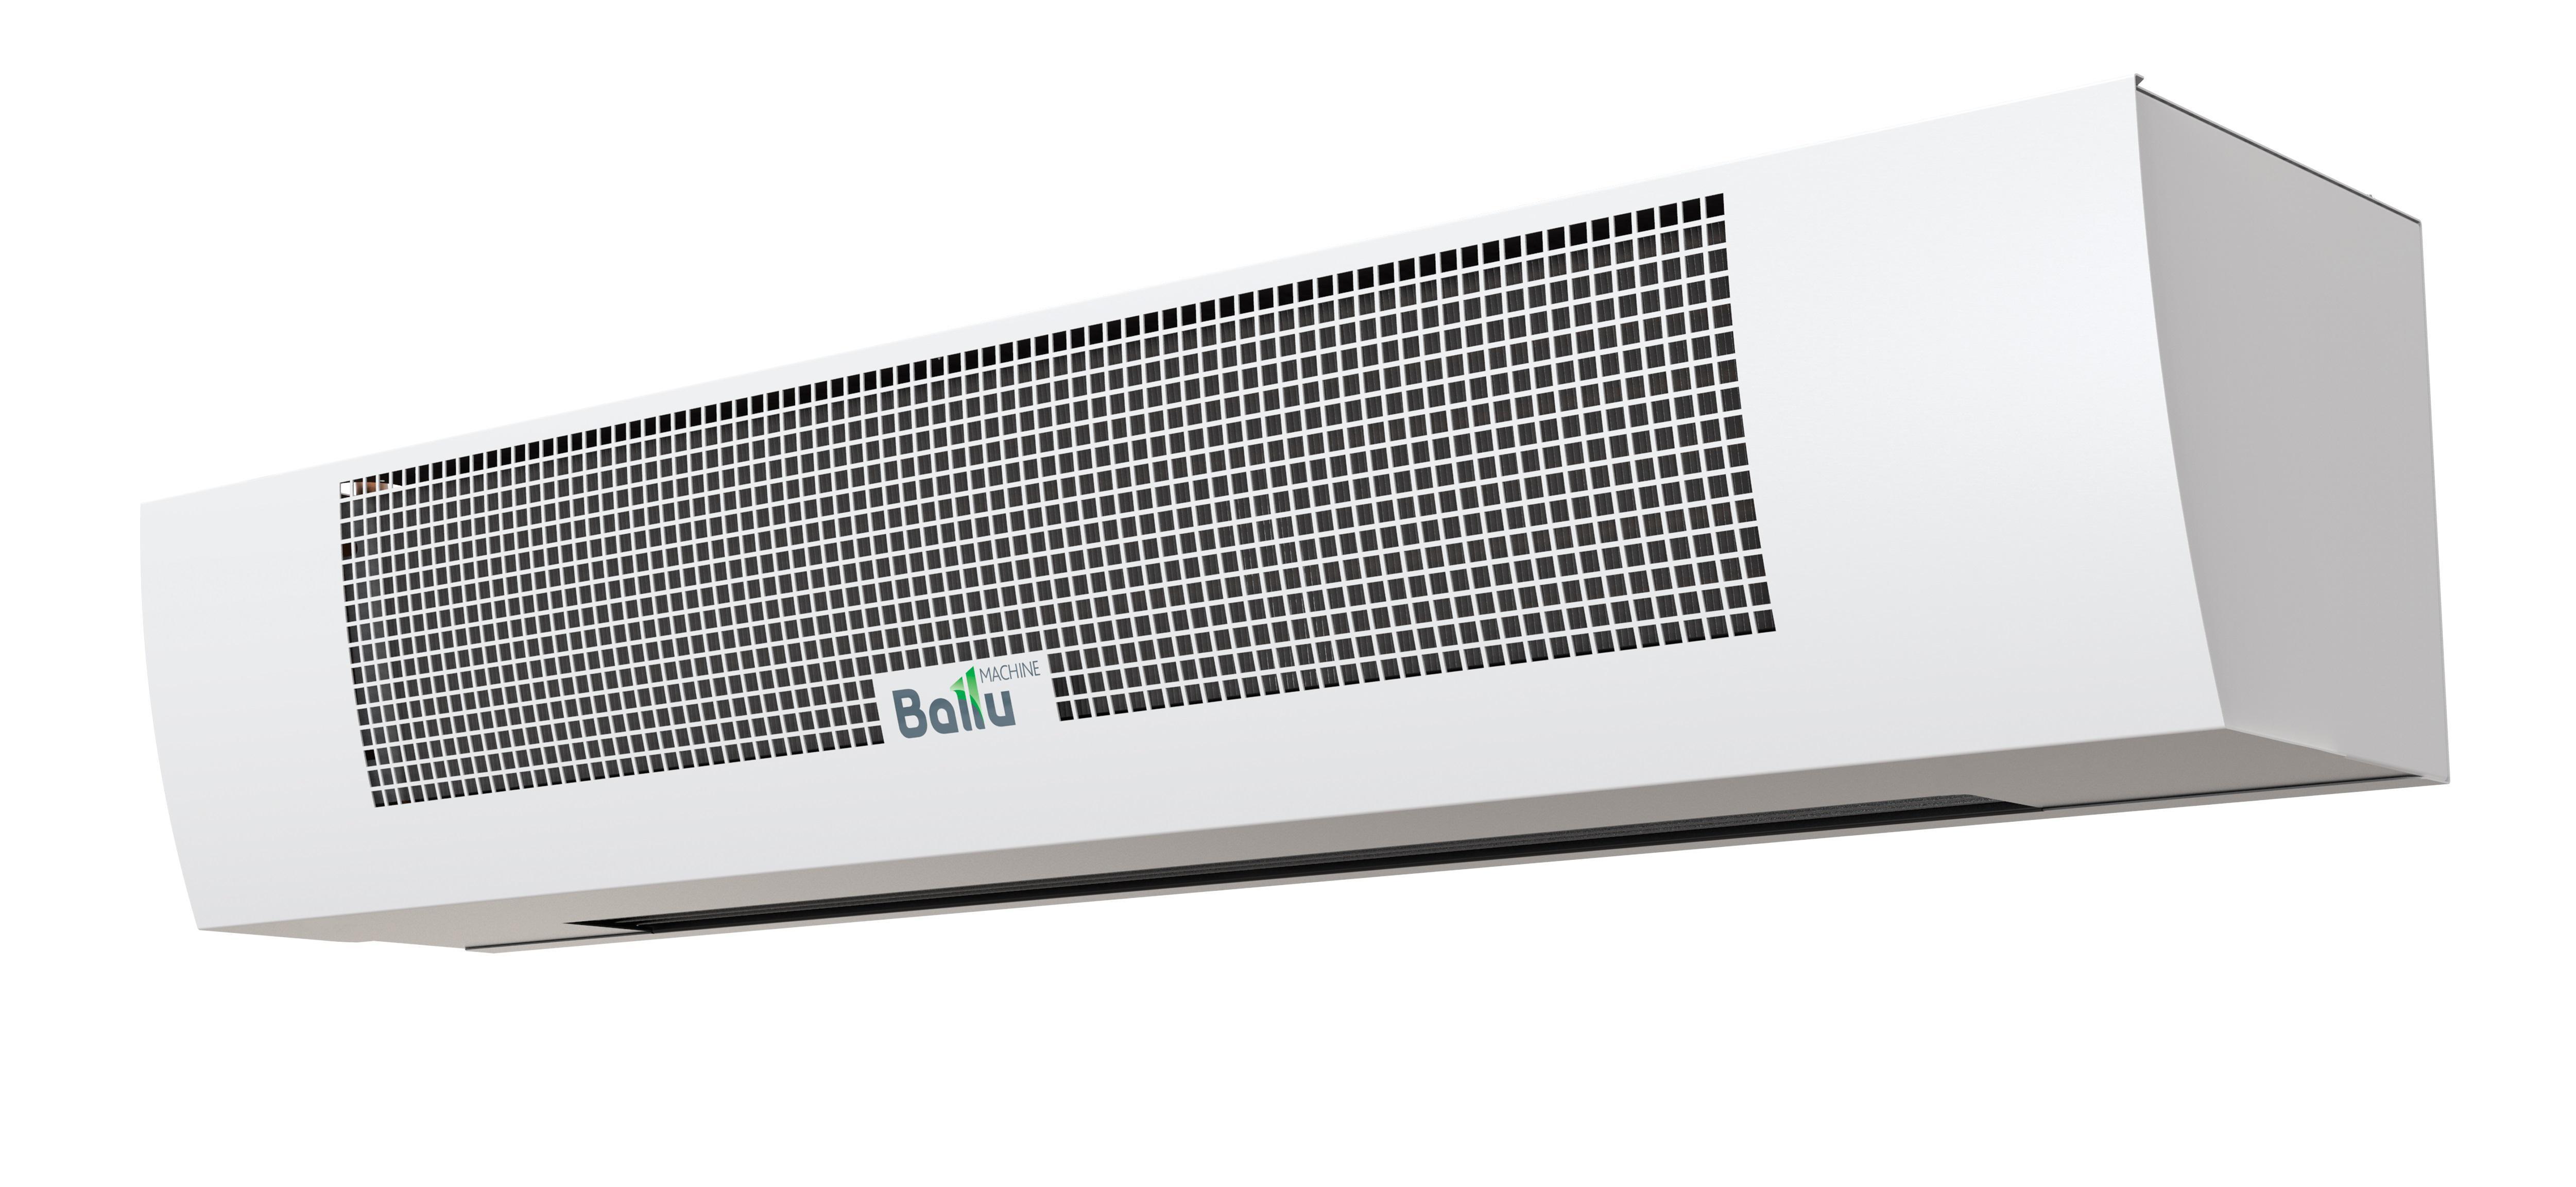 Тепловая завеса Ballu Bhc-b15t09-ps цены онлайн